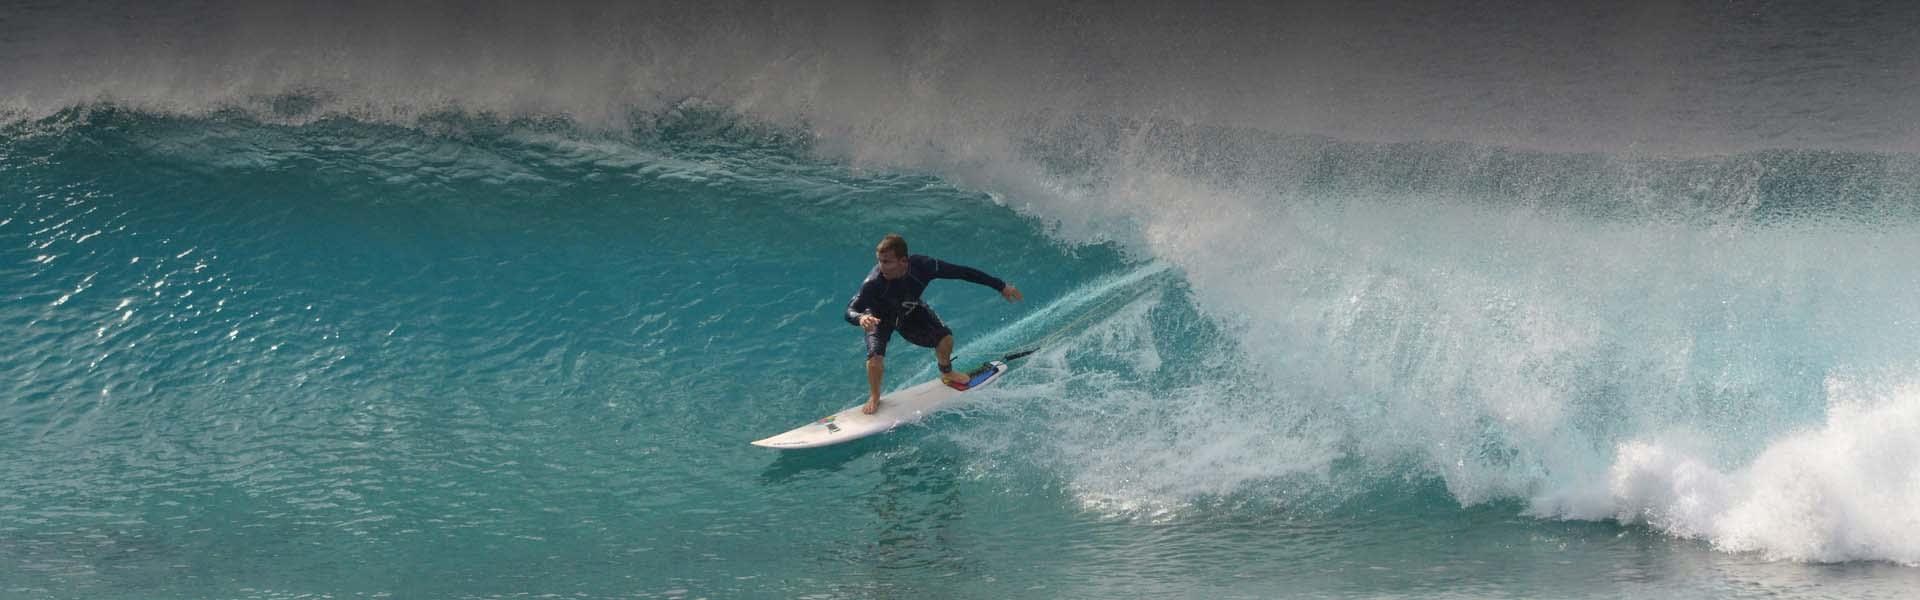 Anantara Dhigu Family Resort Surfing